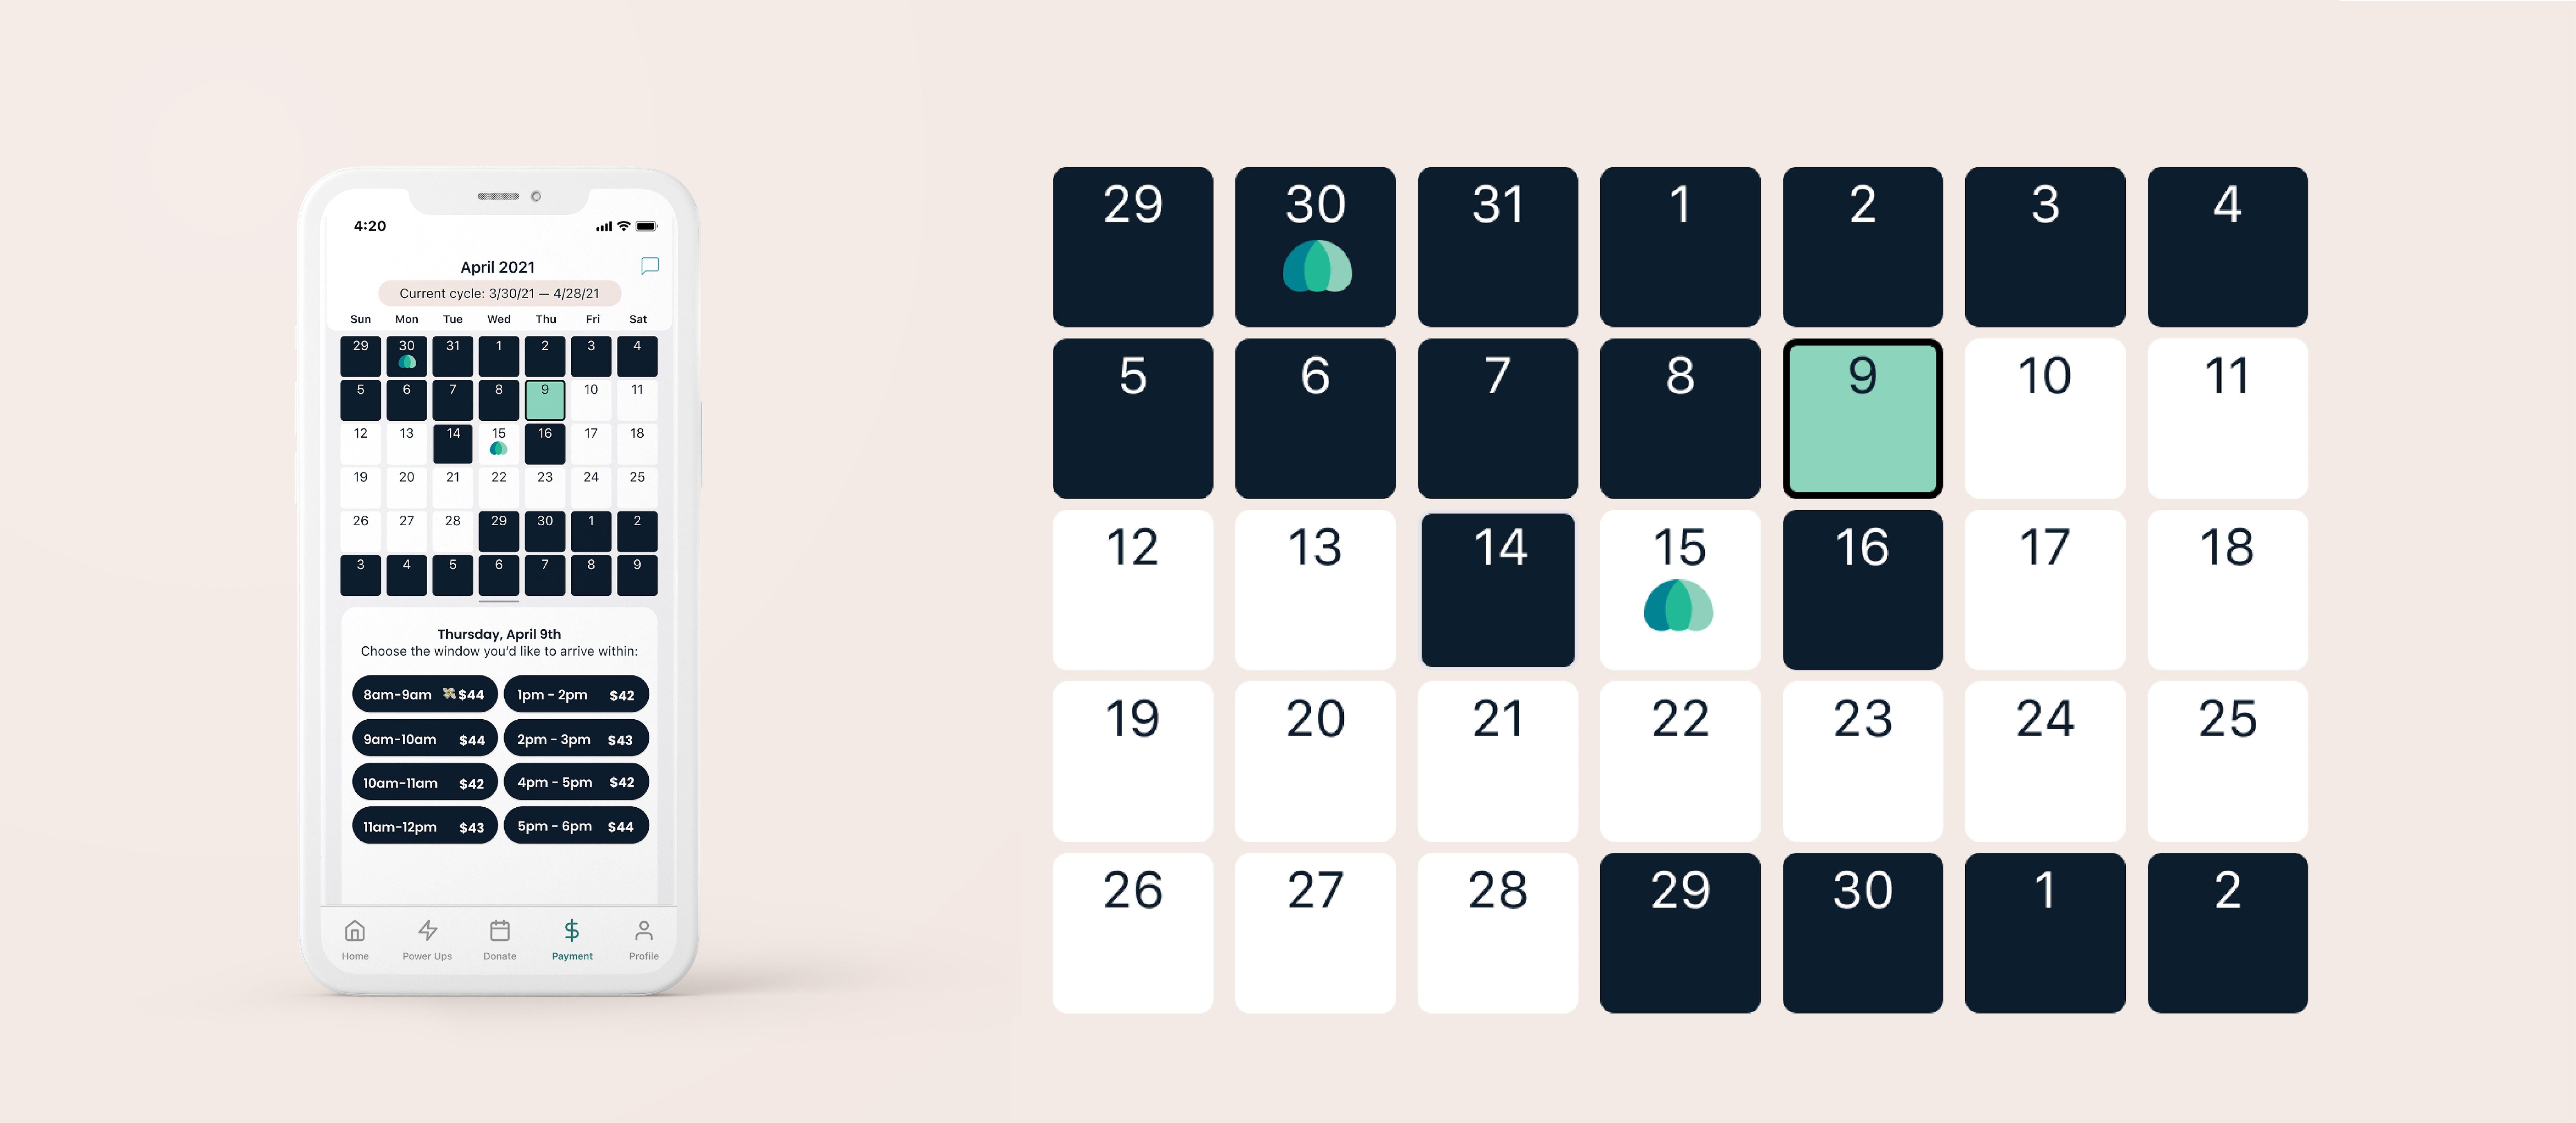 An image of a smartphone showing the parachute app calendar plus a close-up of the calendar